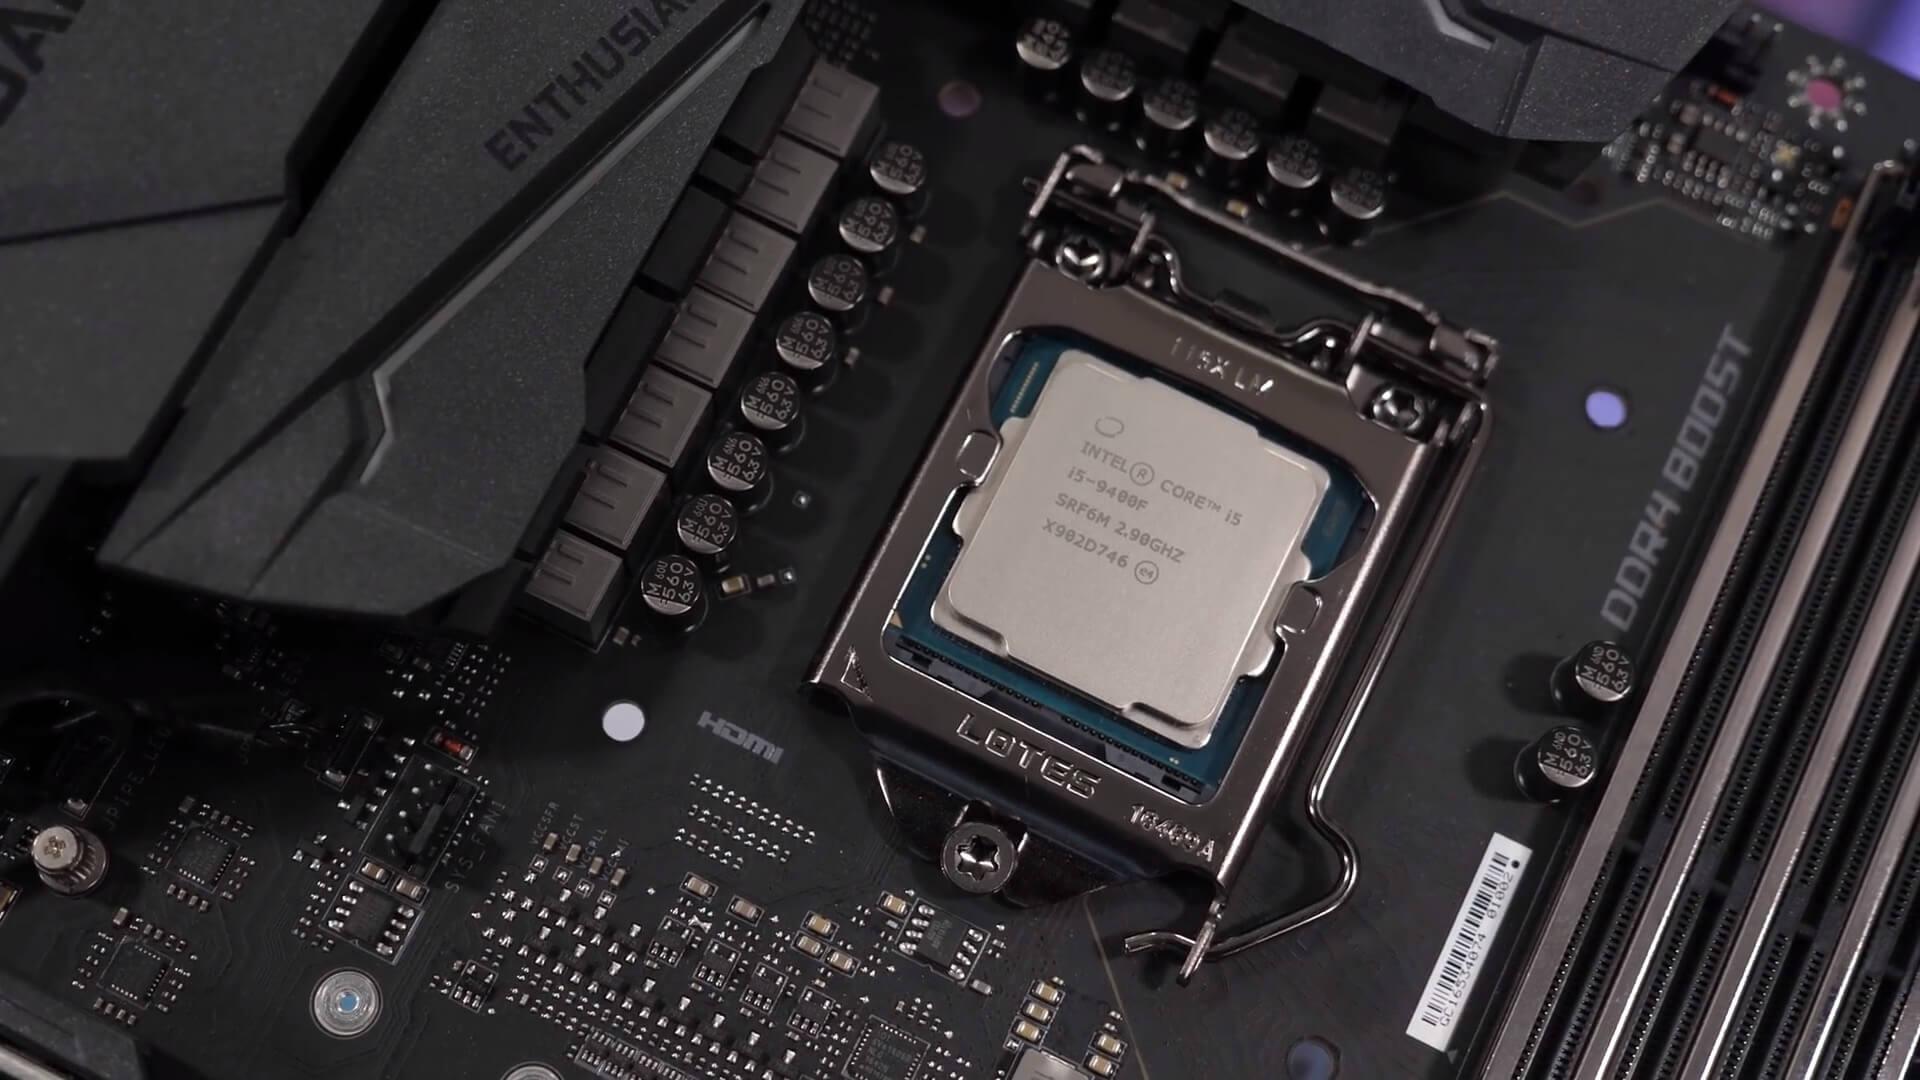 Intel Core I5 9400f Vs Amd Ryzen 5 2600x